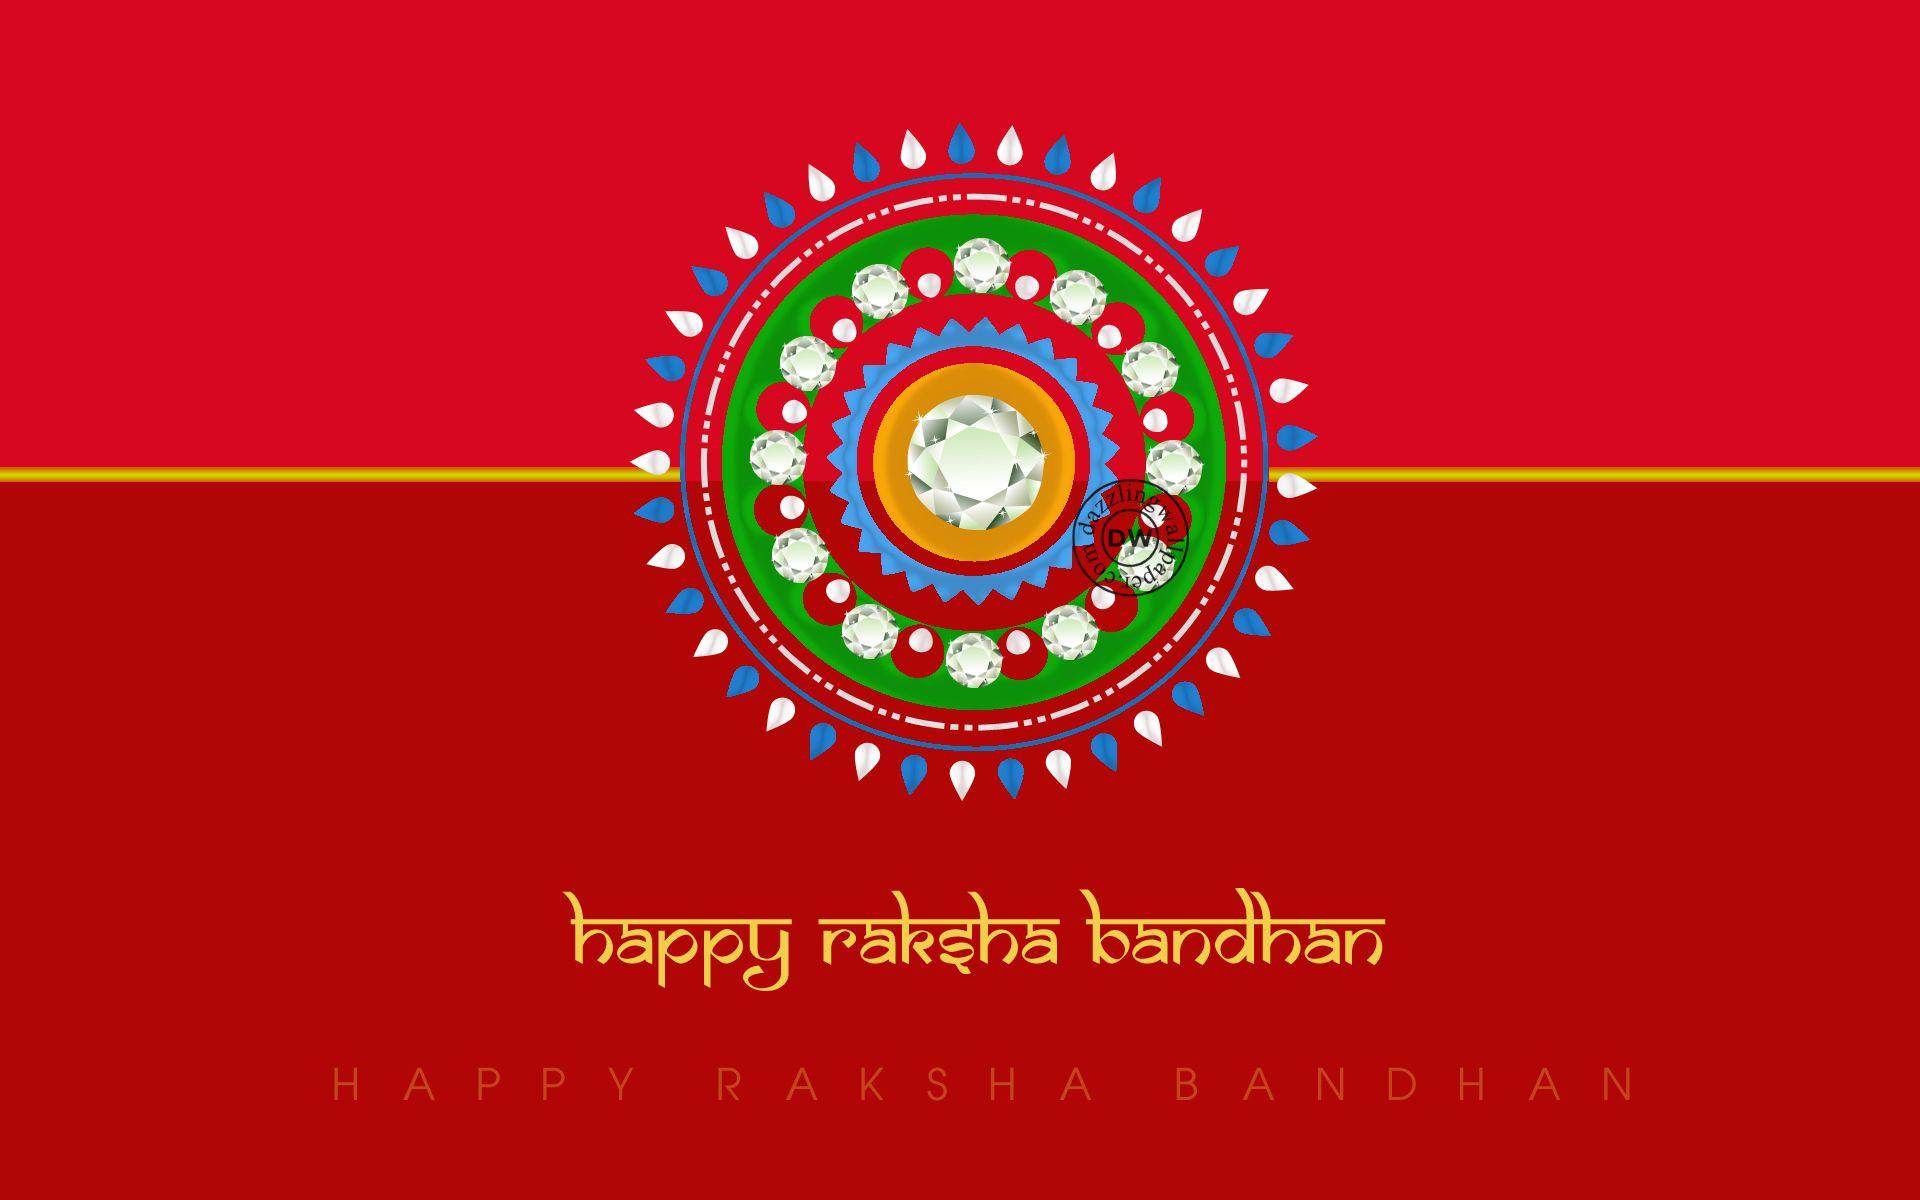 Rakshabandhan 2014 HD Wallpaper Raksha Bandhan Brother Sister